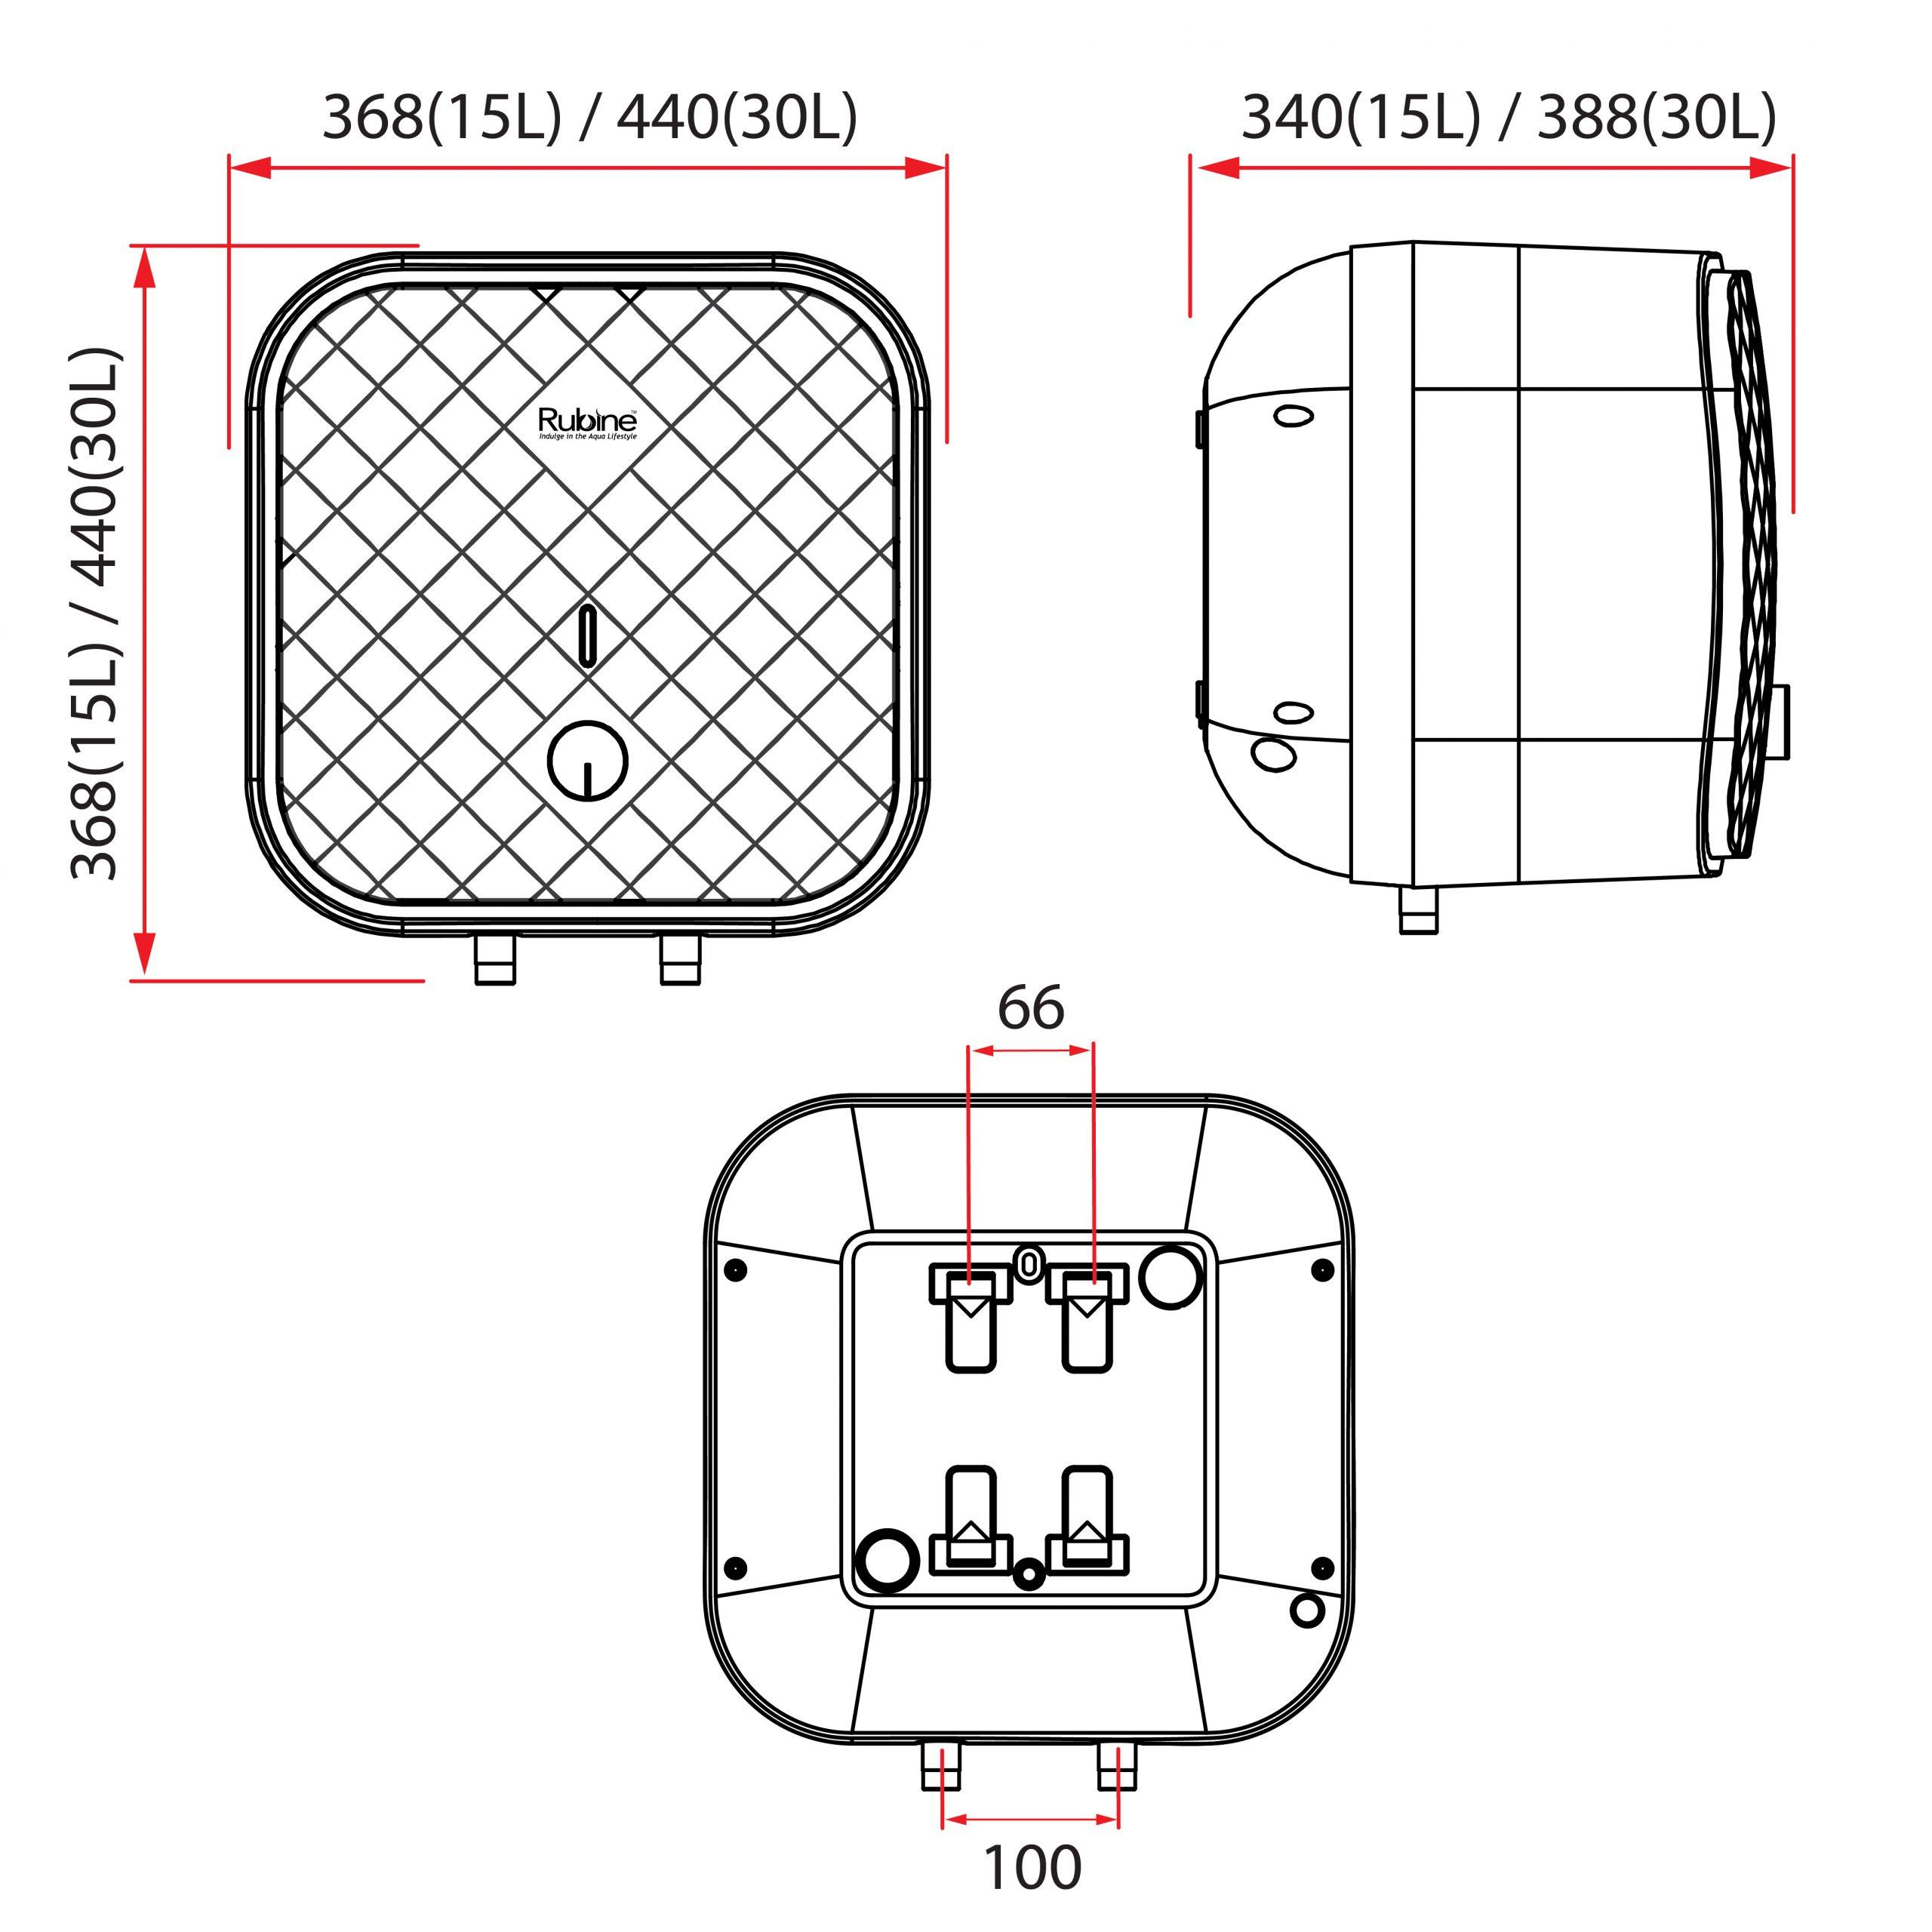 rubine-mt30-features-storage-water-heater-city-singapore